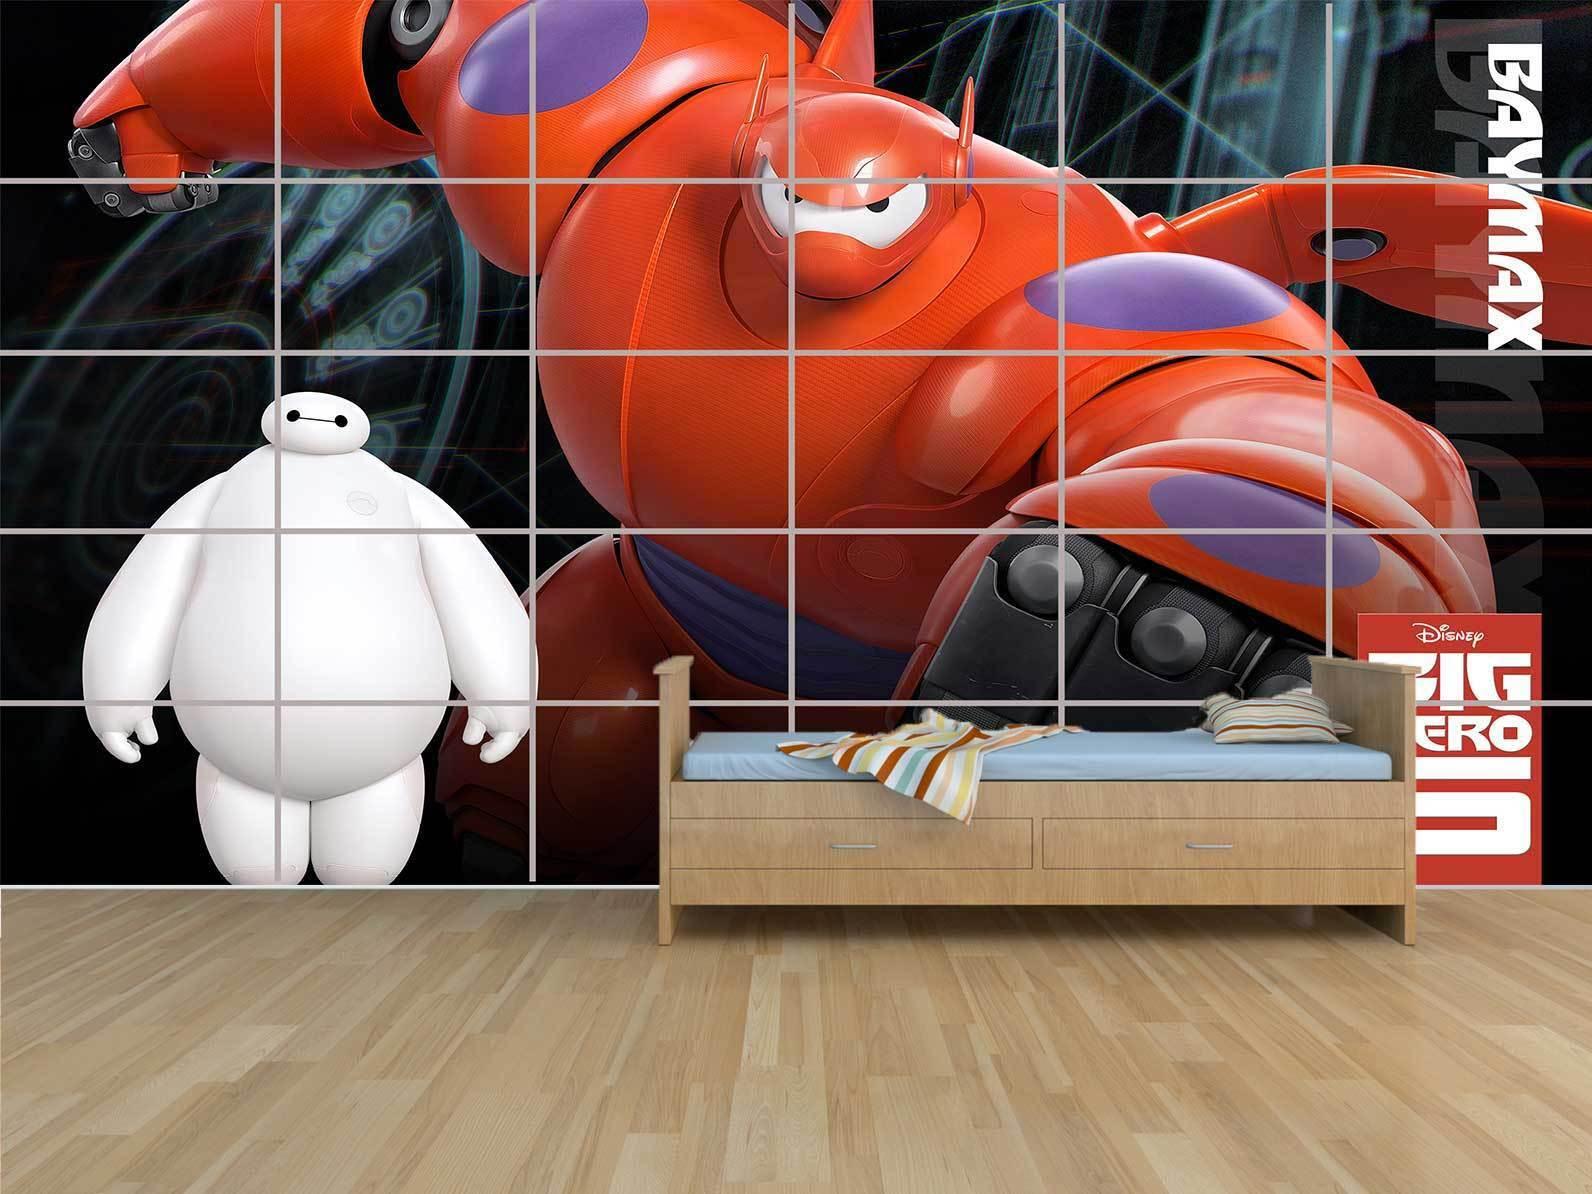 New Big Hero  Movie - Baymax - KIDS - Wall Poster  ROOM KIDS